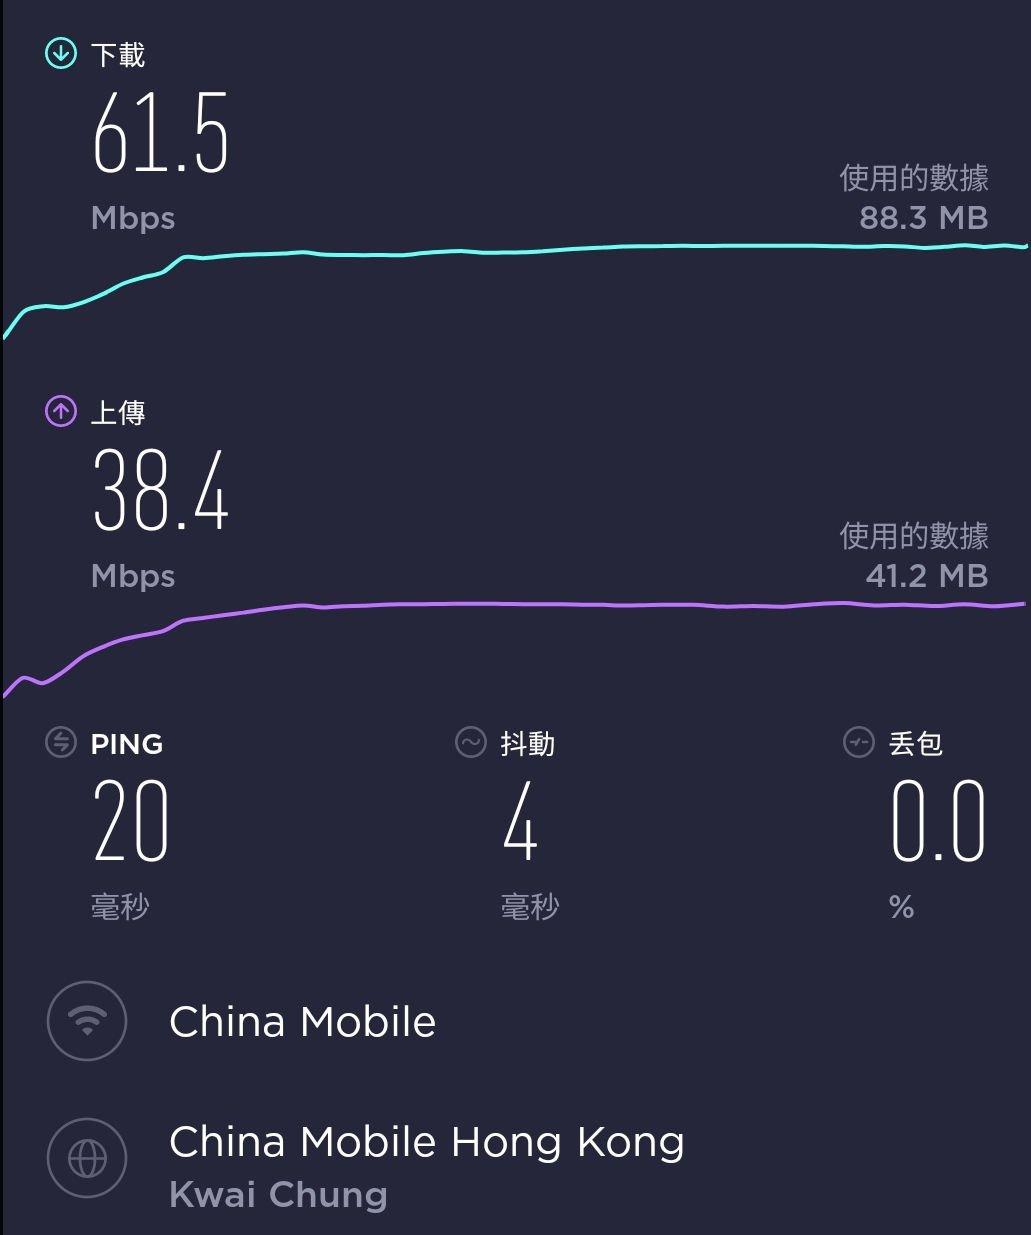 TP-Link Deco X20-4G LTE 網絡測試